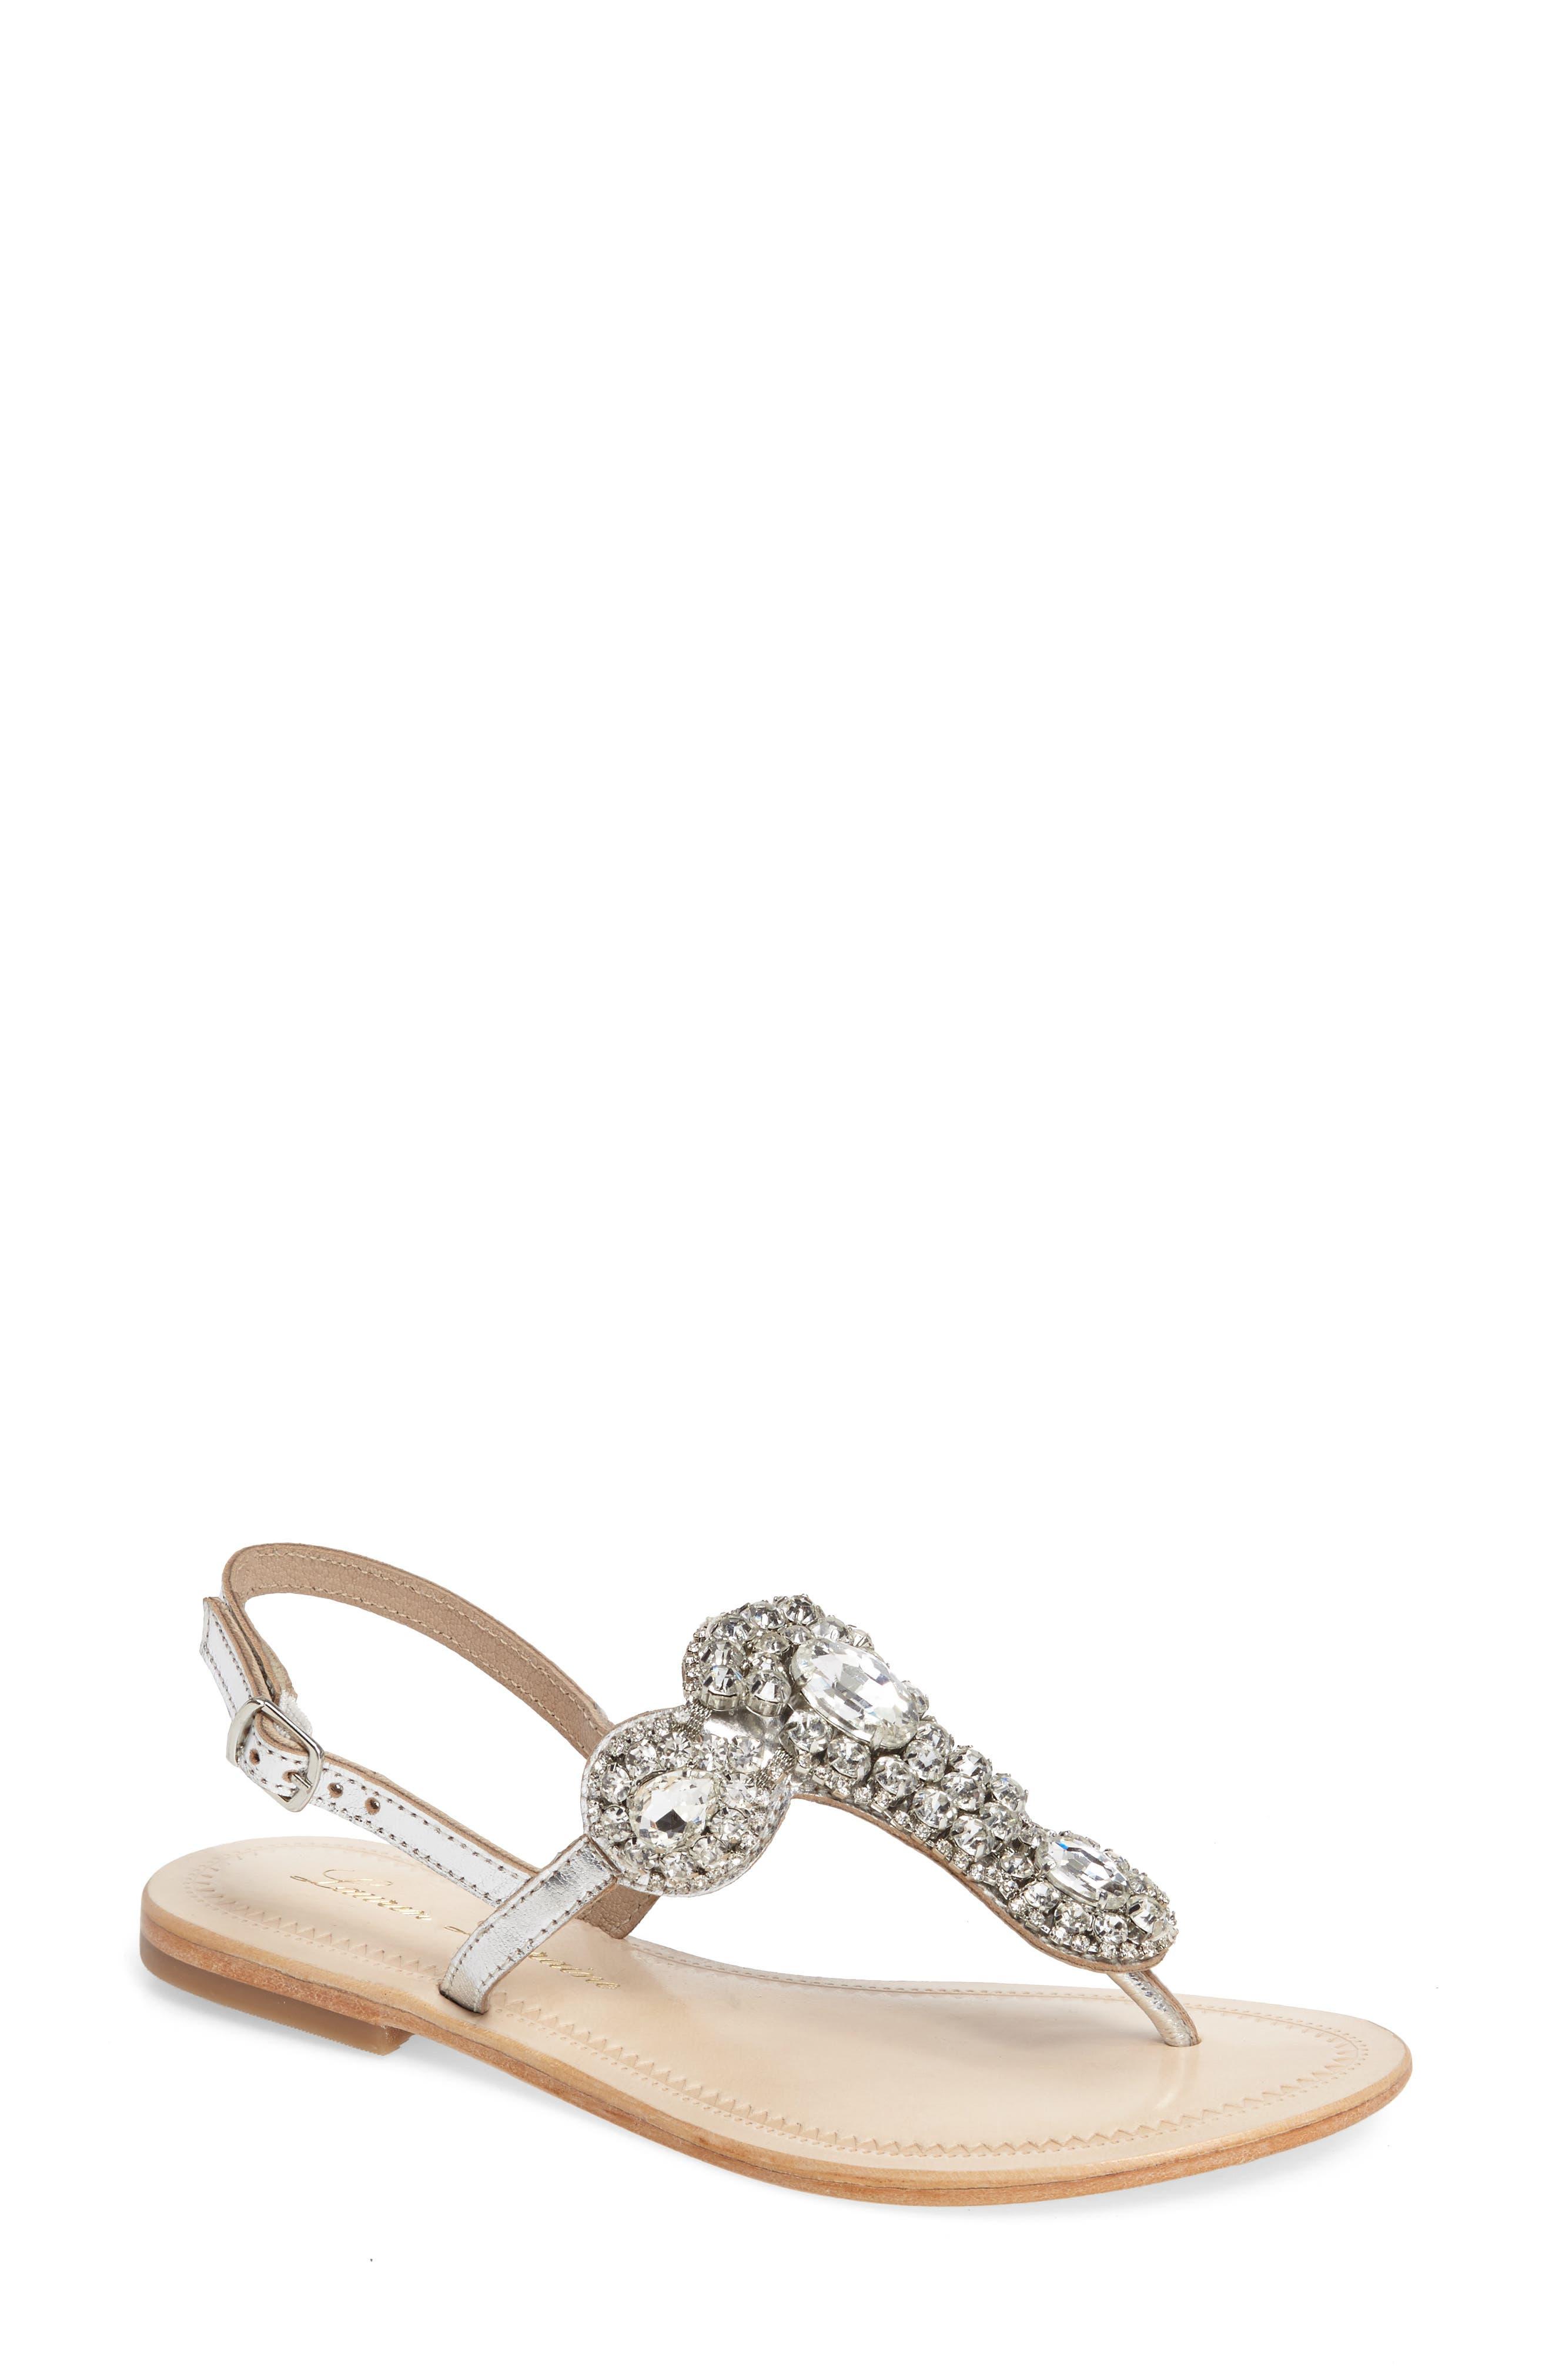 Lauren Lorraine Bahama Crystal Embellished Sandal (Women)